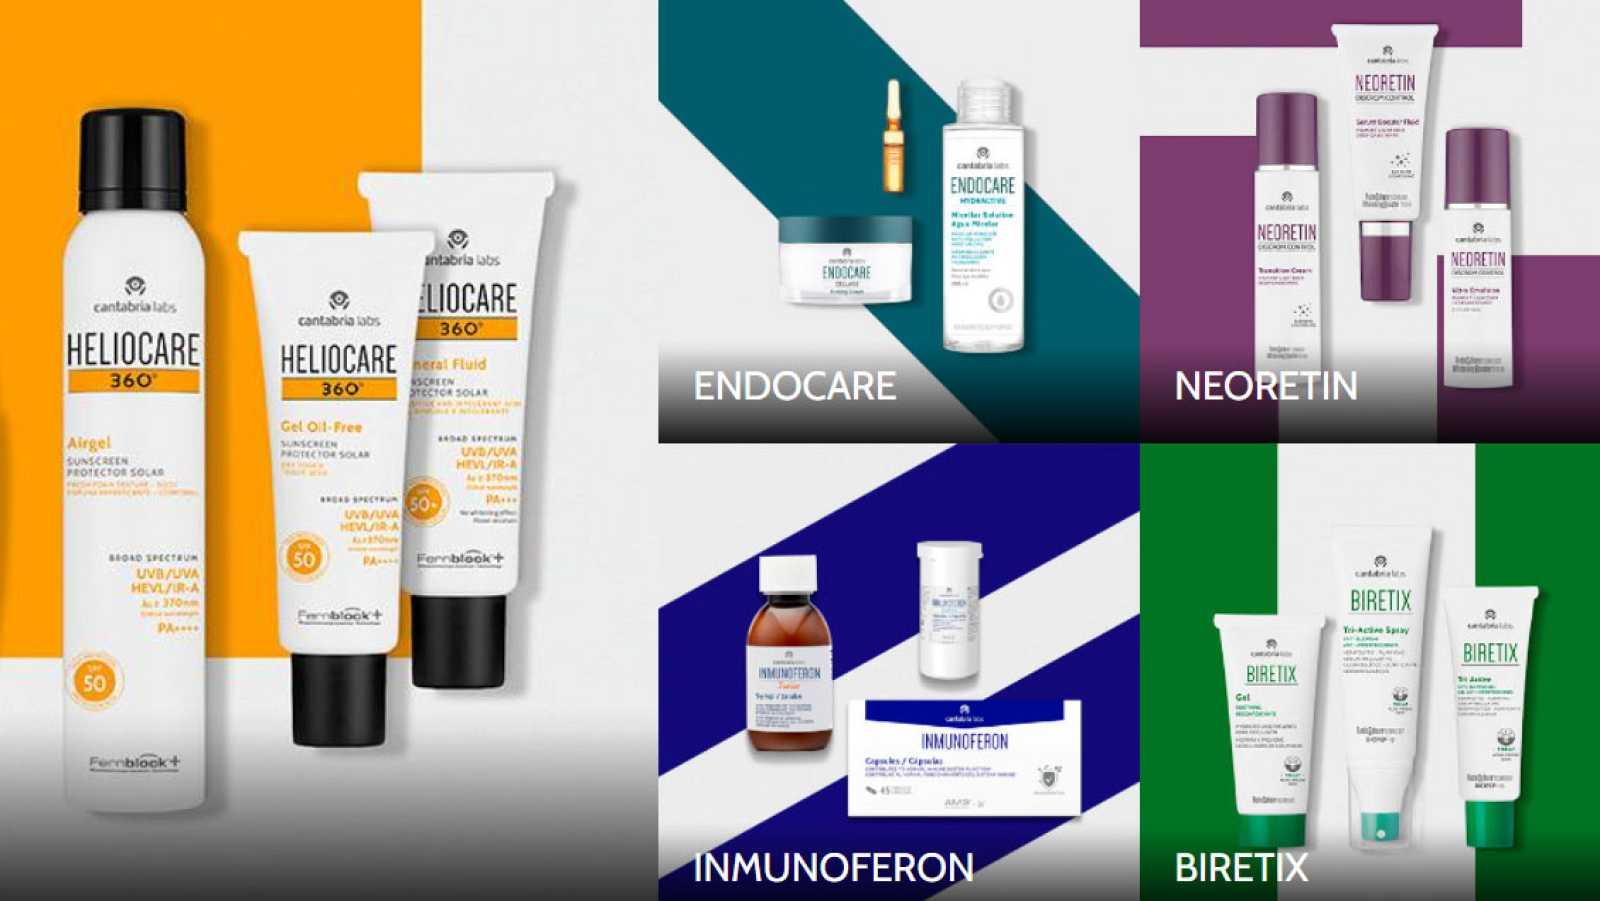 Marca España - Referente en prescripción dermatológica en Europa - 07/05/21 - escuchar ahora